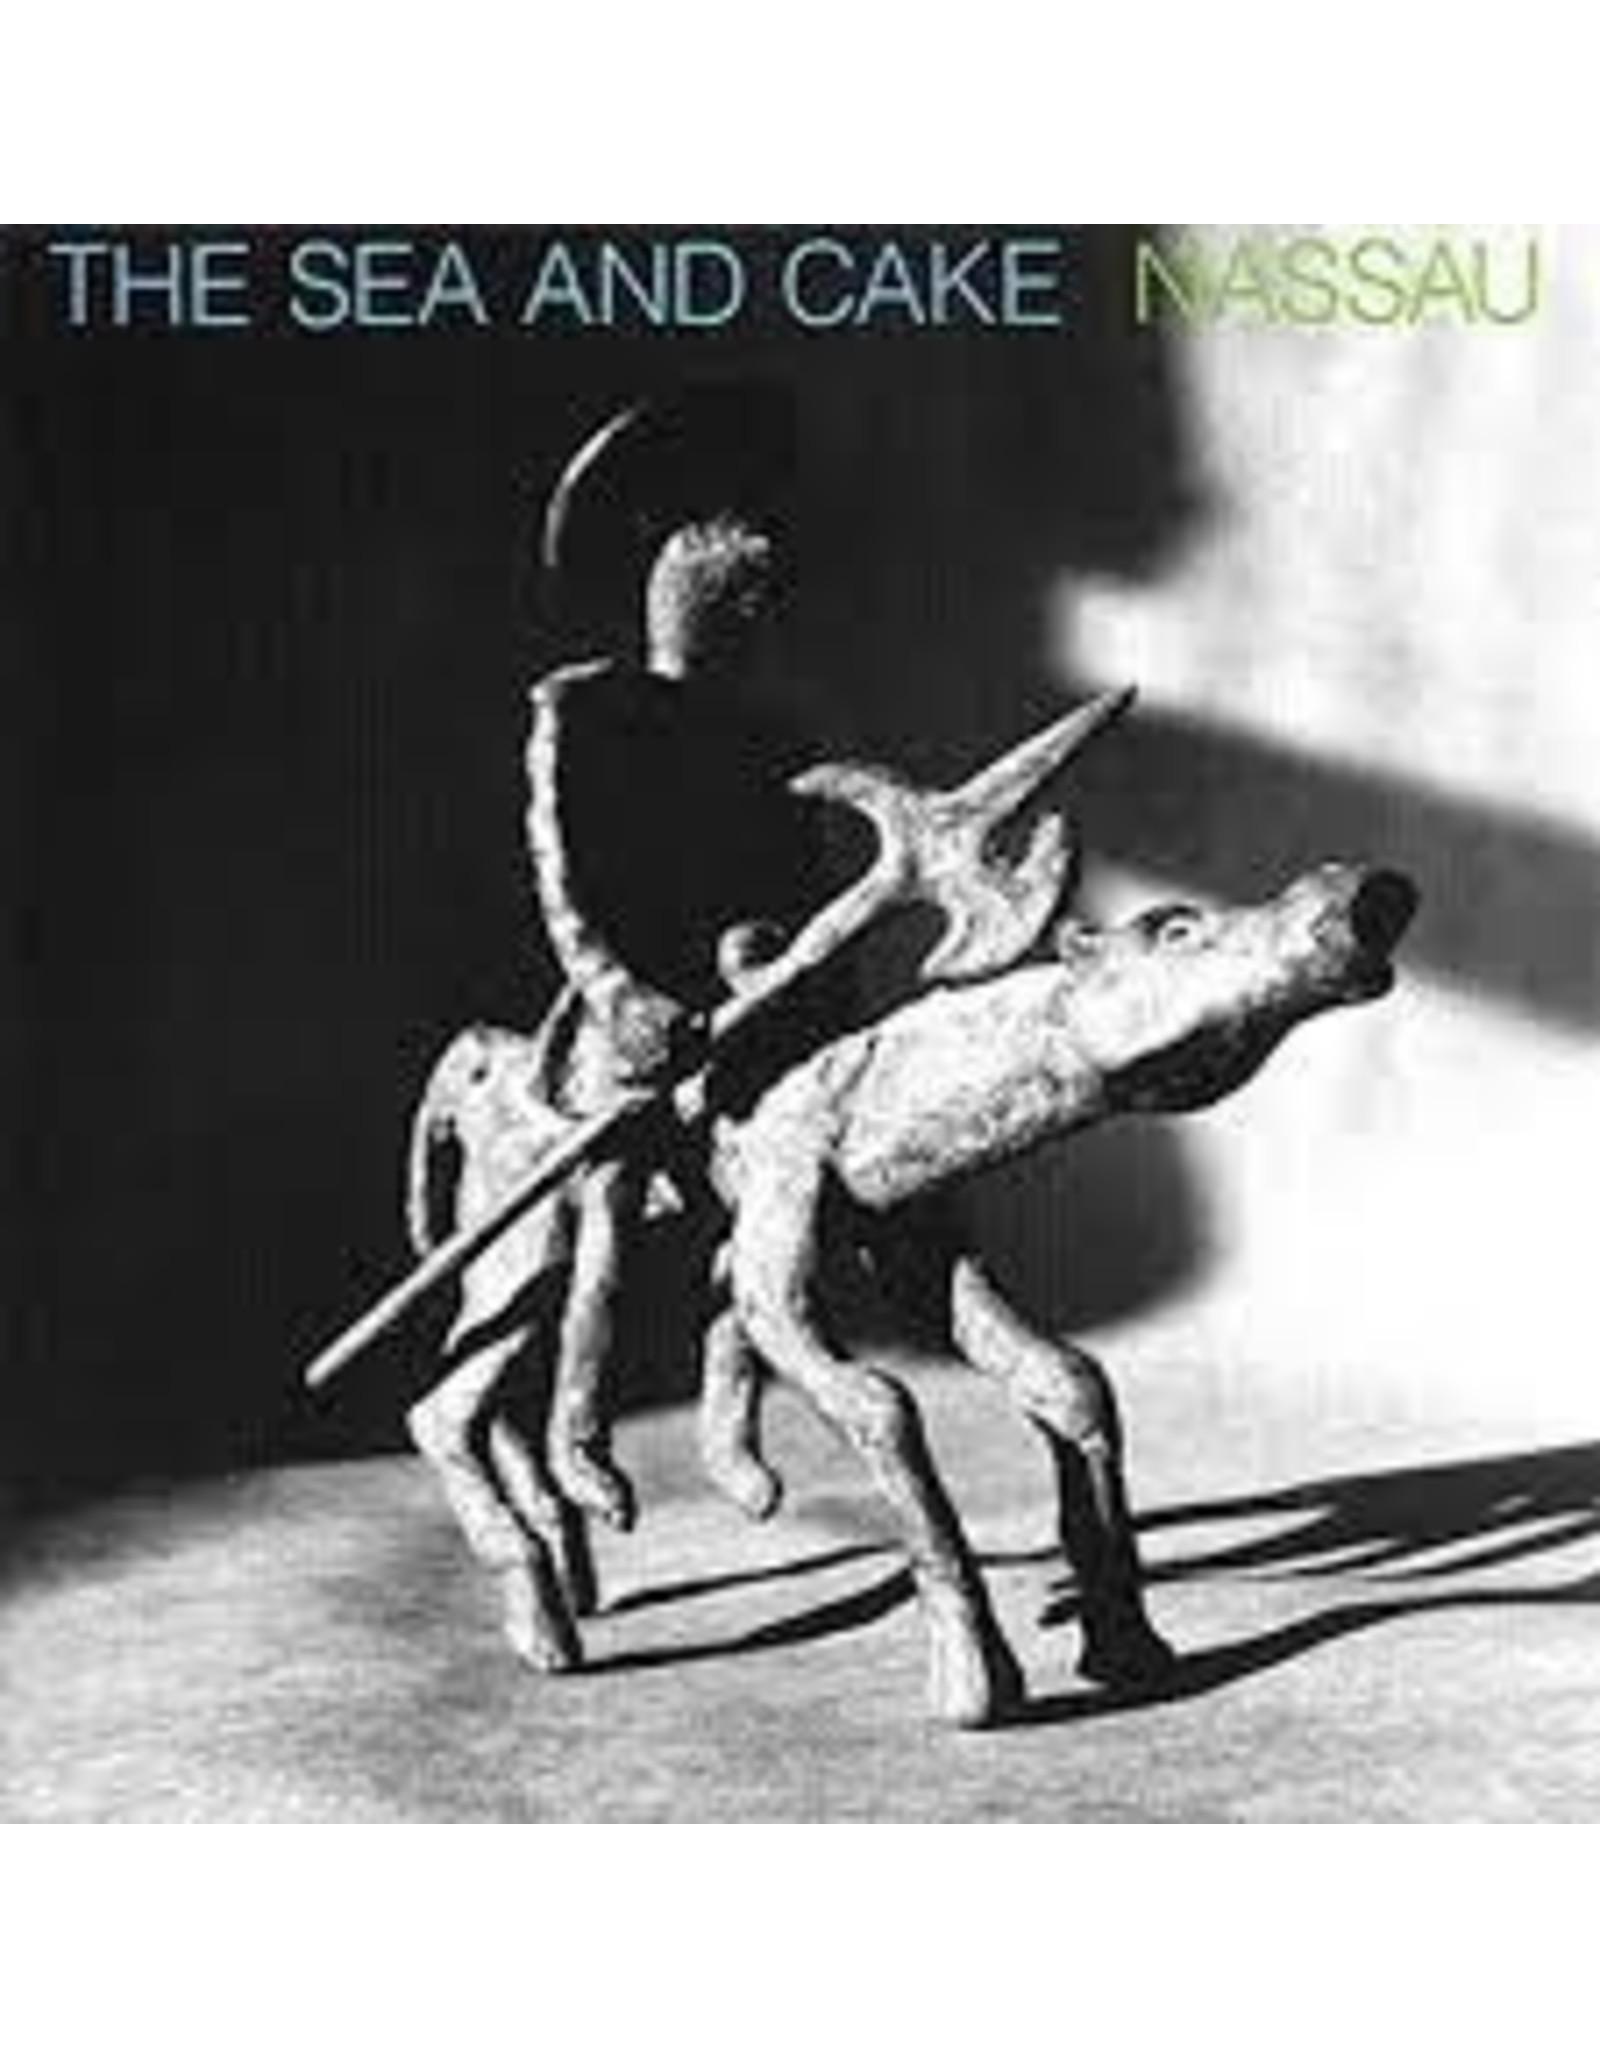 New Vinyl The Sea And Cake - Nassau 2LP